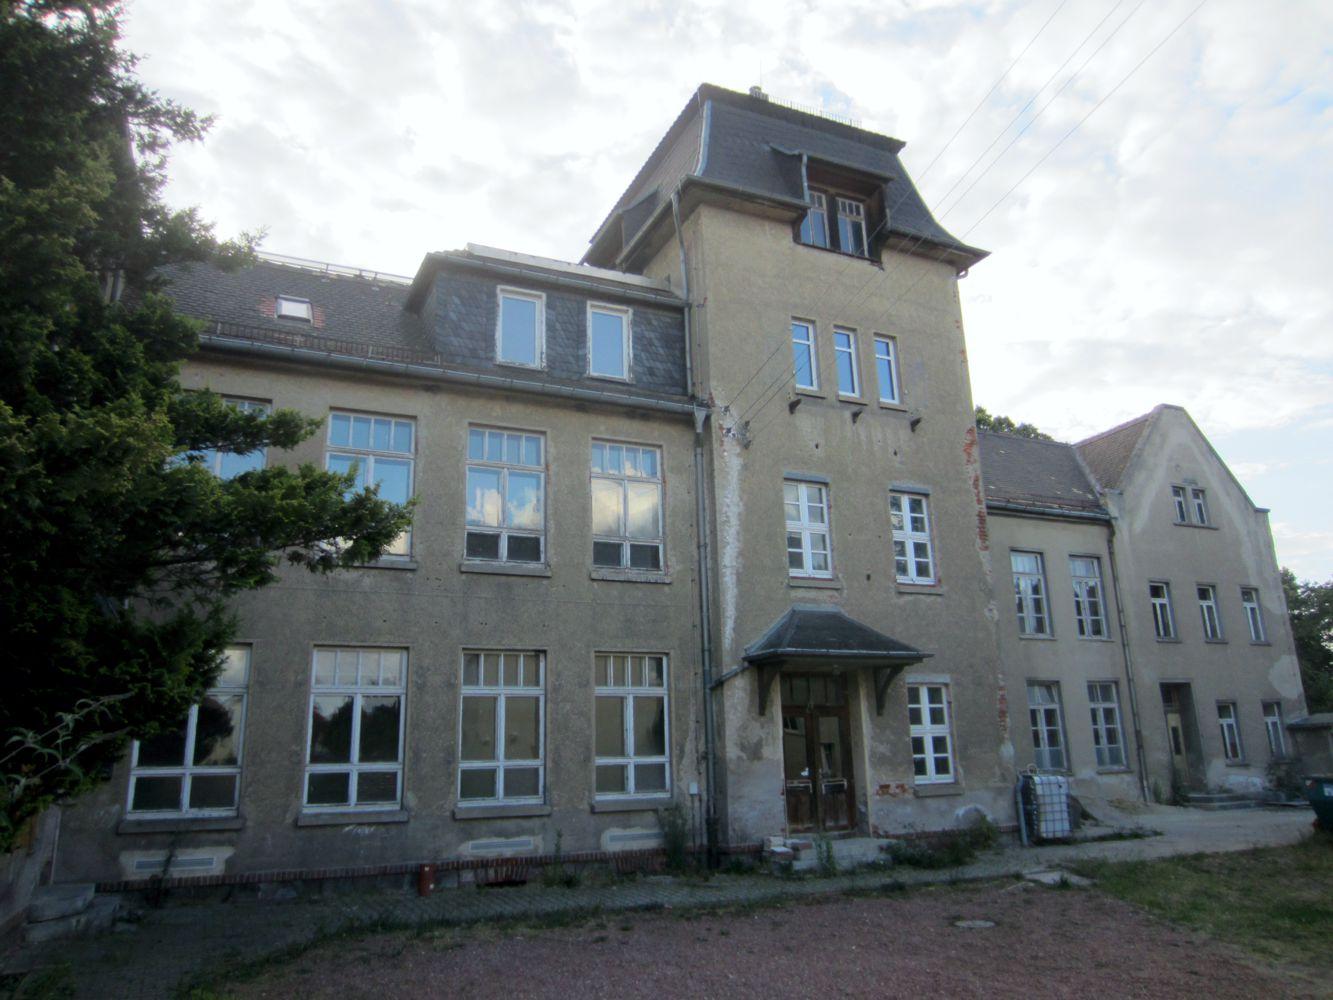 ehemalige Schule